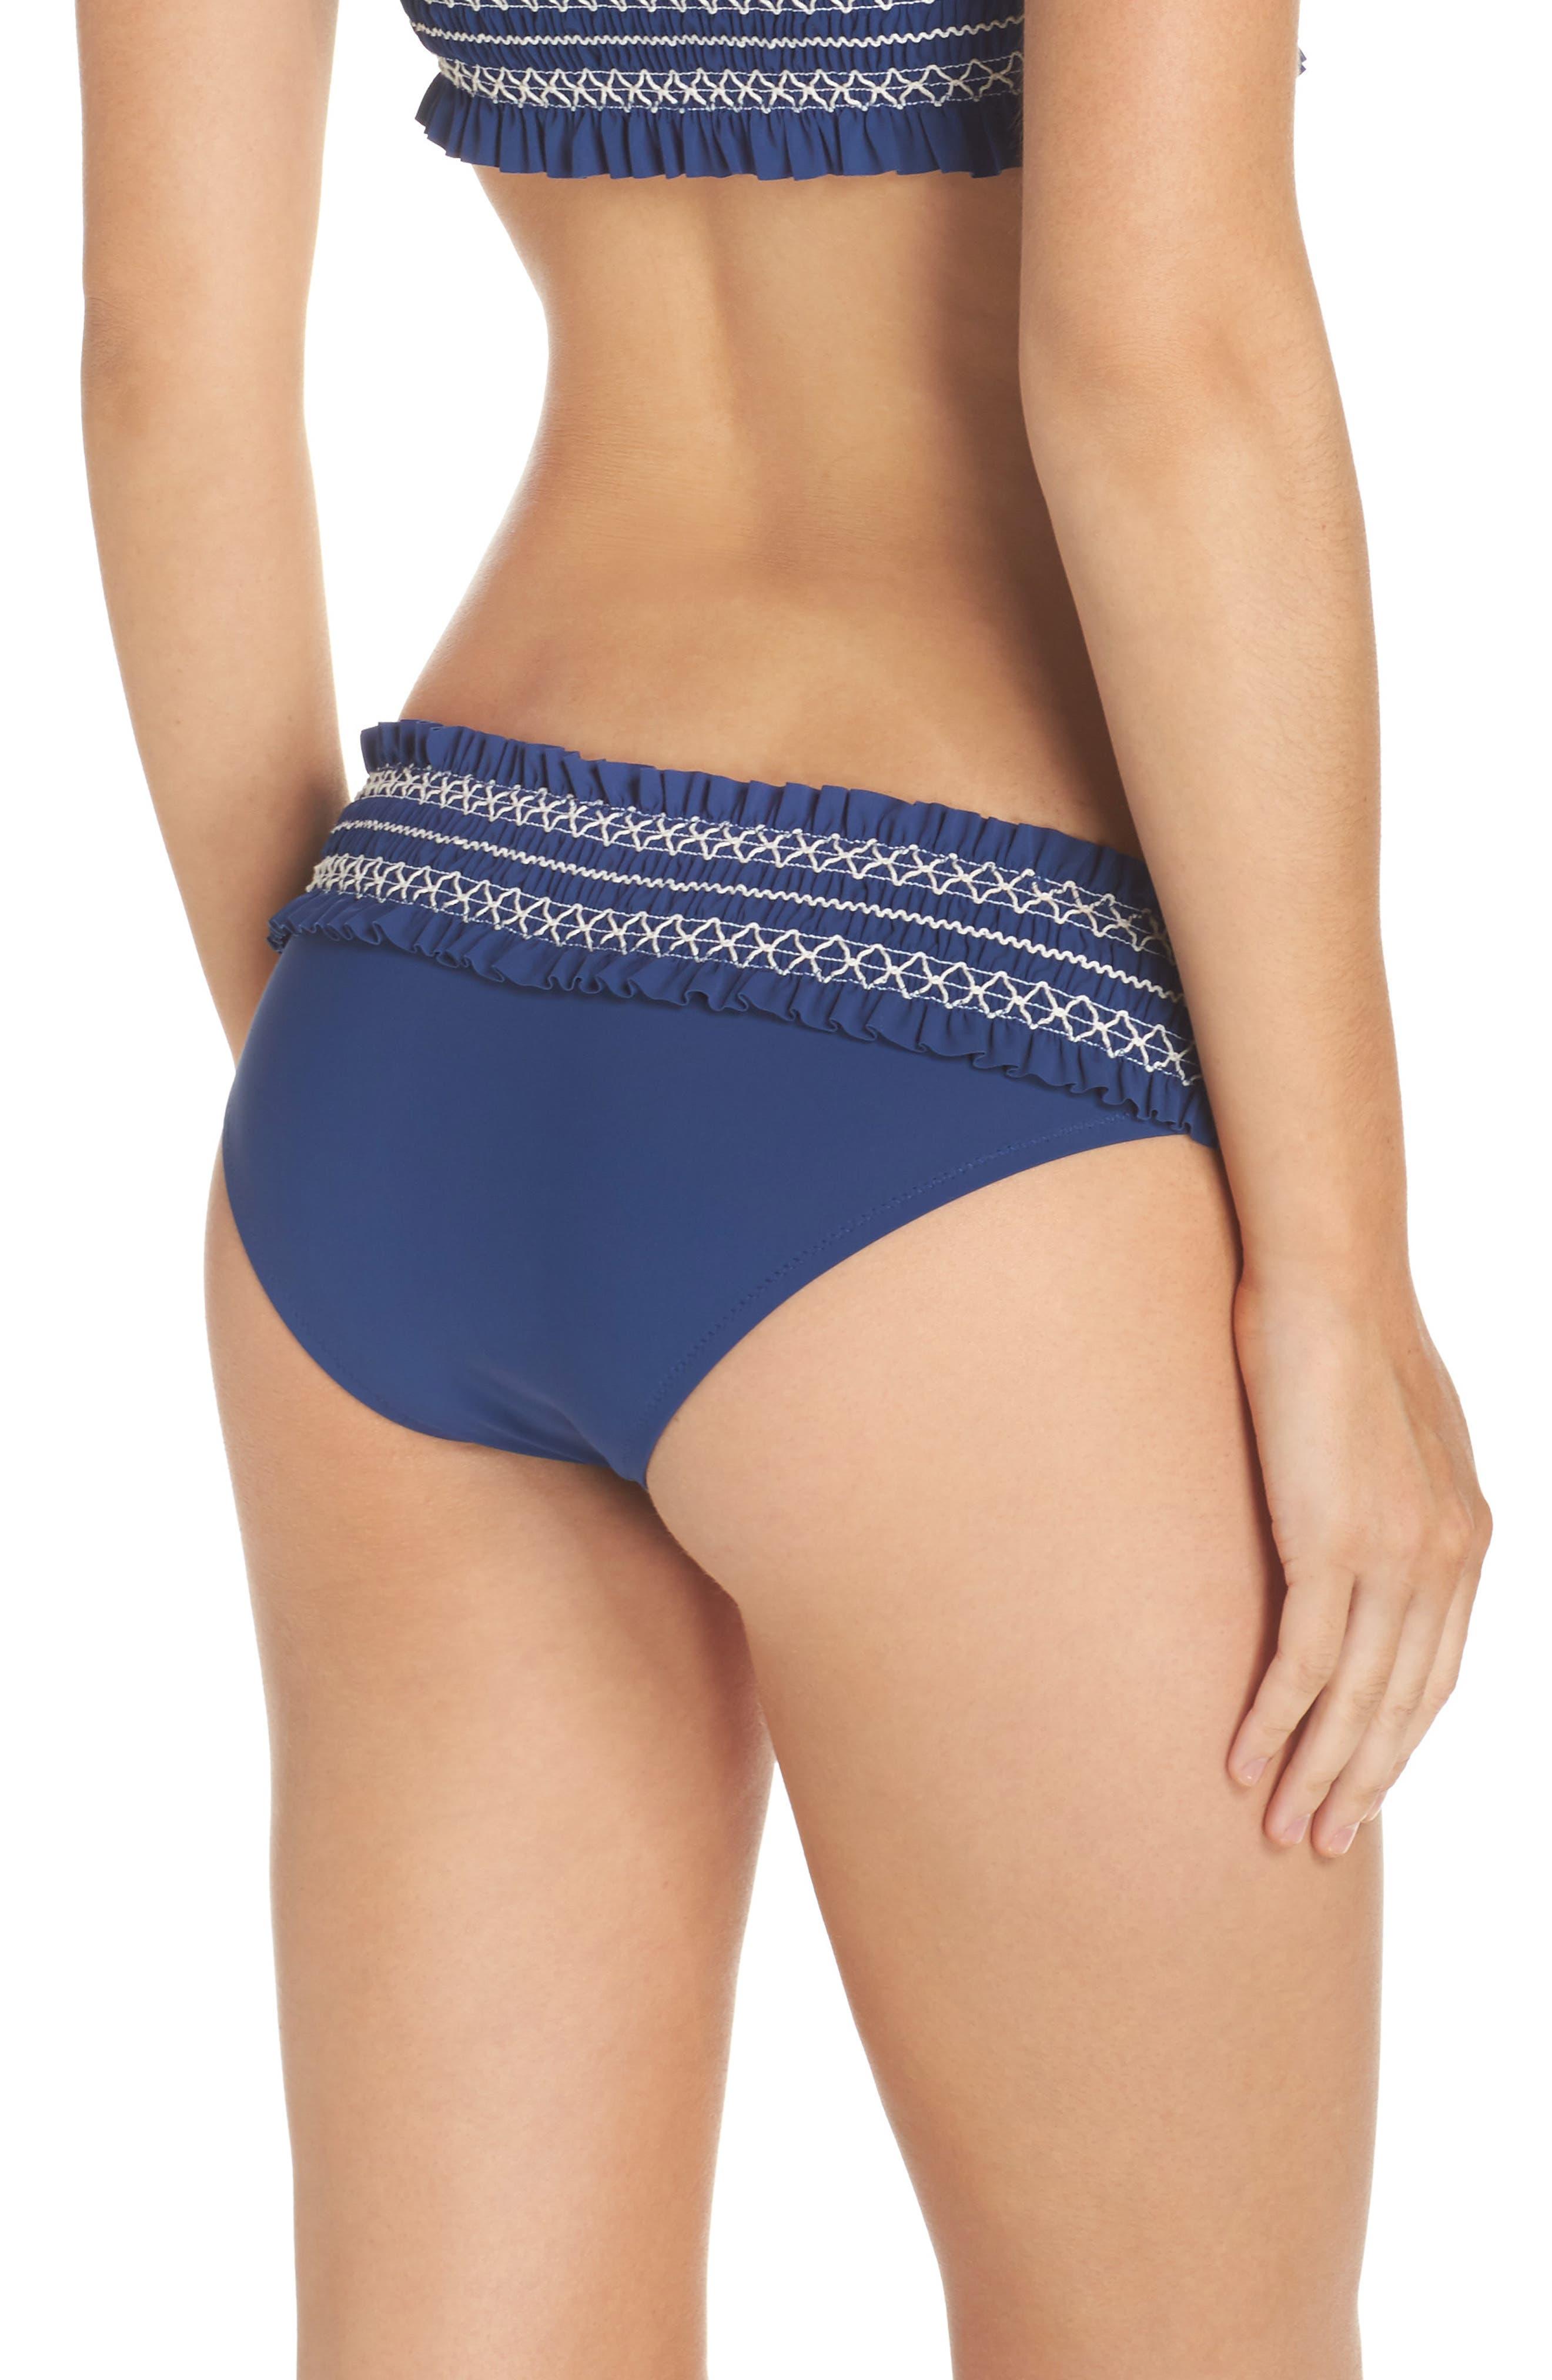 Costa Smocked Hipster Bikini Bottoms,                             Alternate thumbnail 2, color,                             Capri Blue/ New Ivory